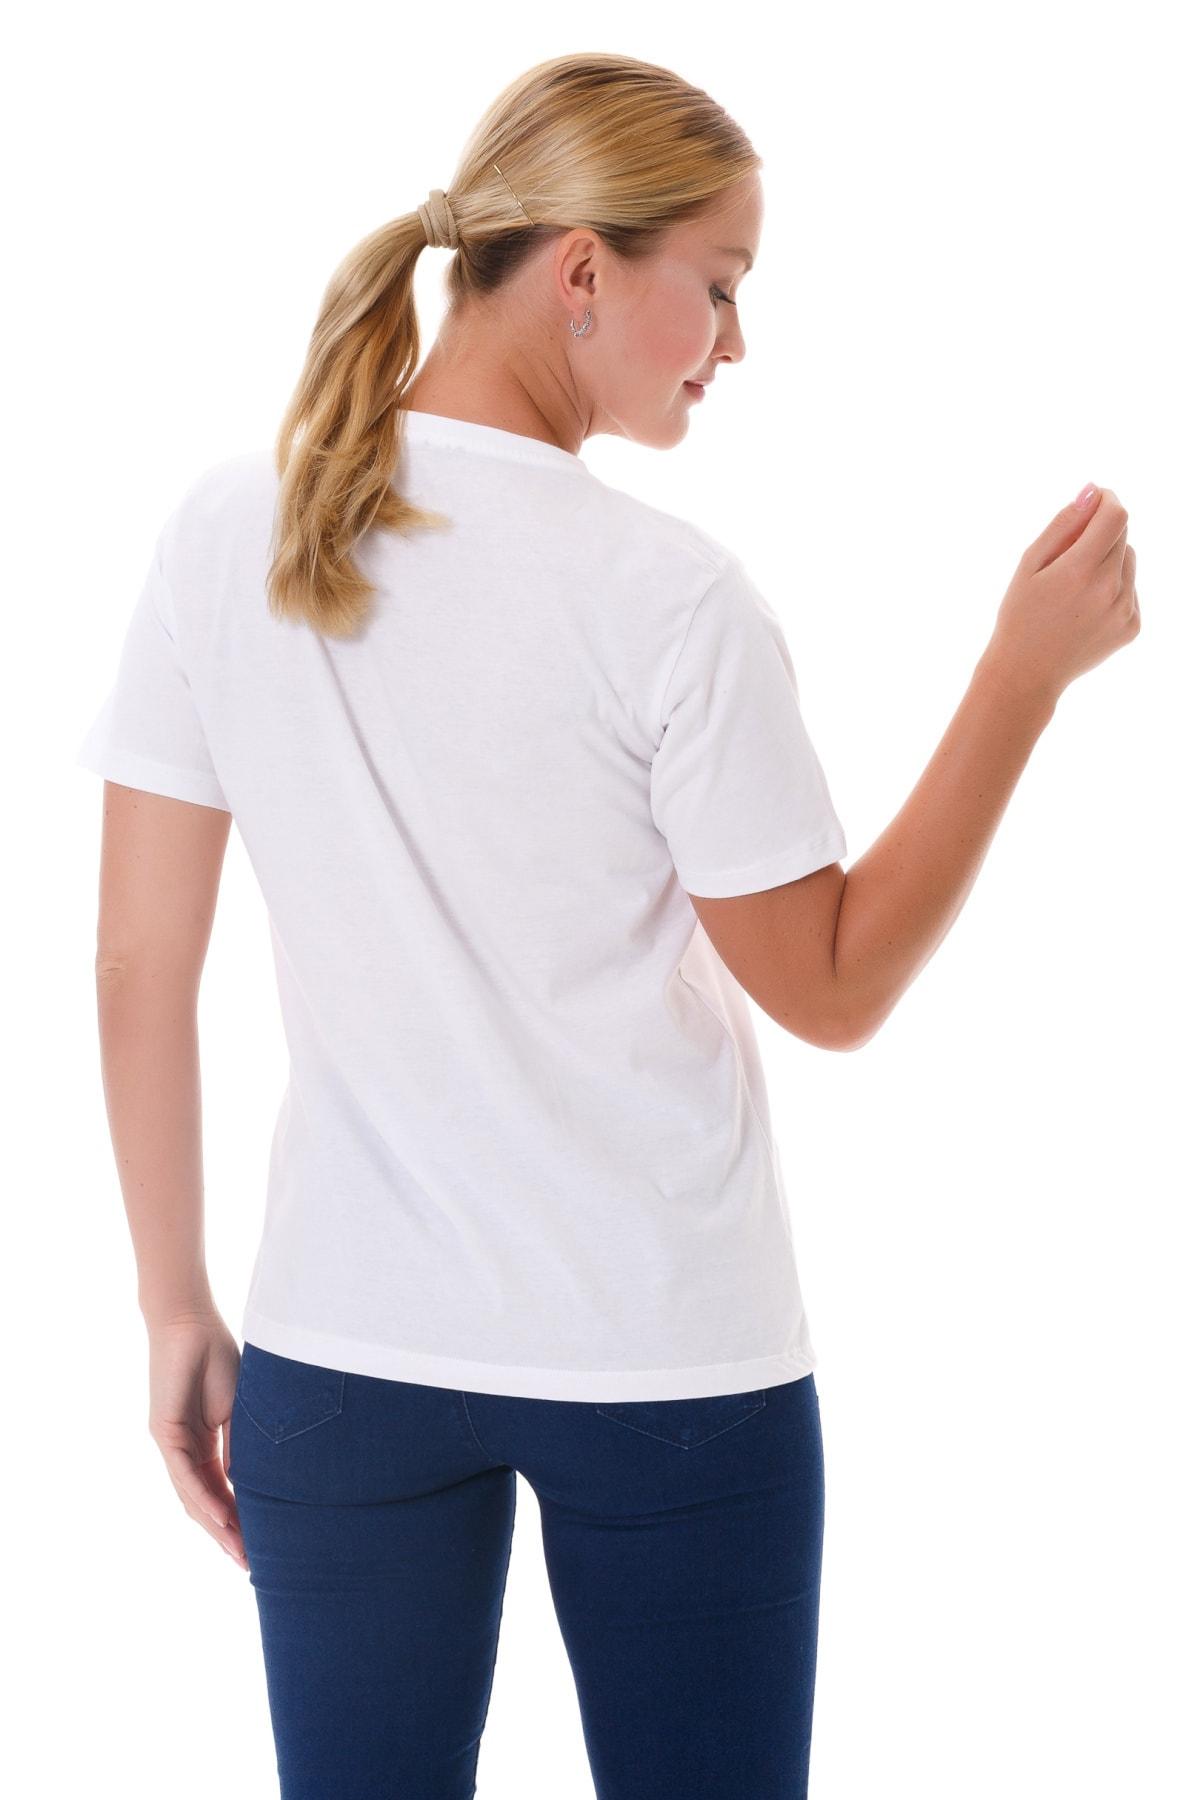 NOT AT HOME Kadın Beyaz Bisiklet Yaka Dağ Desenli T-shirt 2